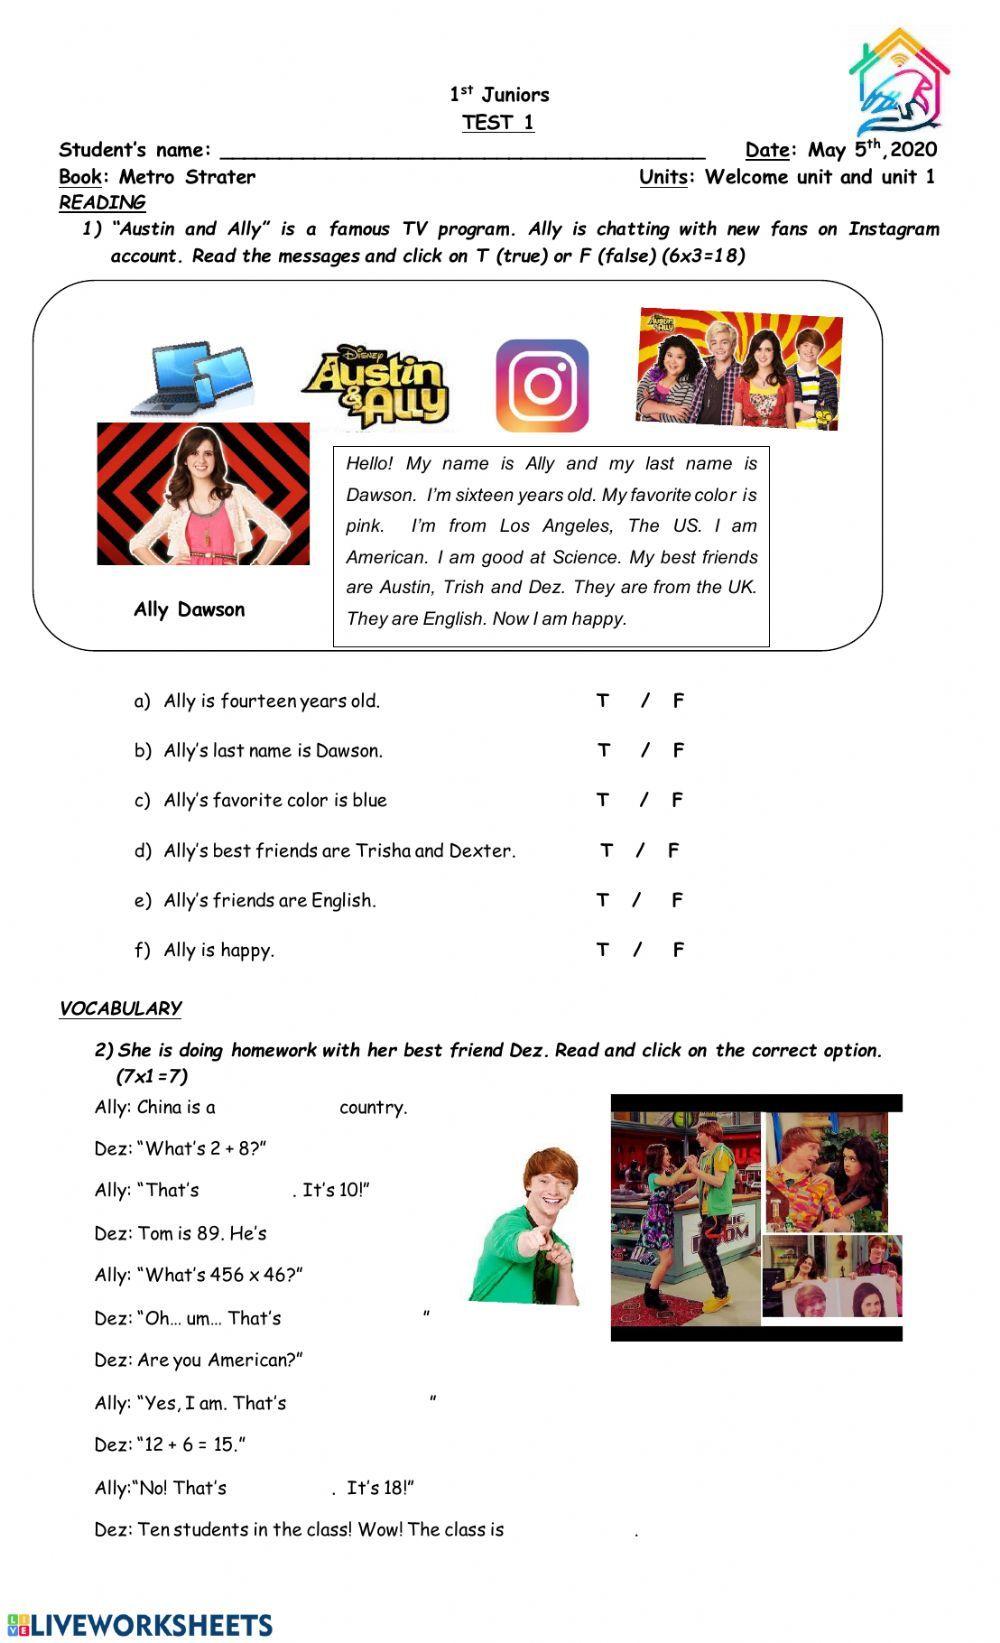 Hanabei's Worksheet